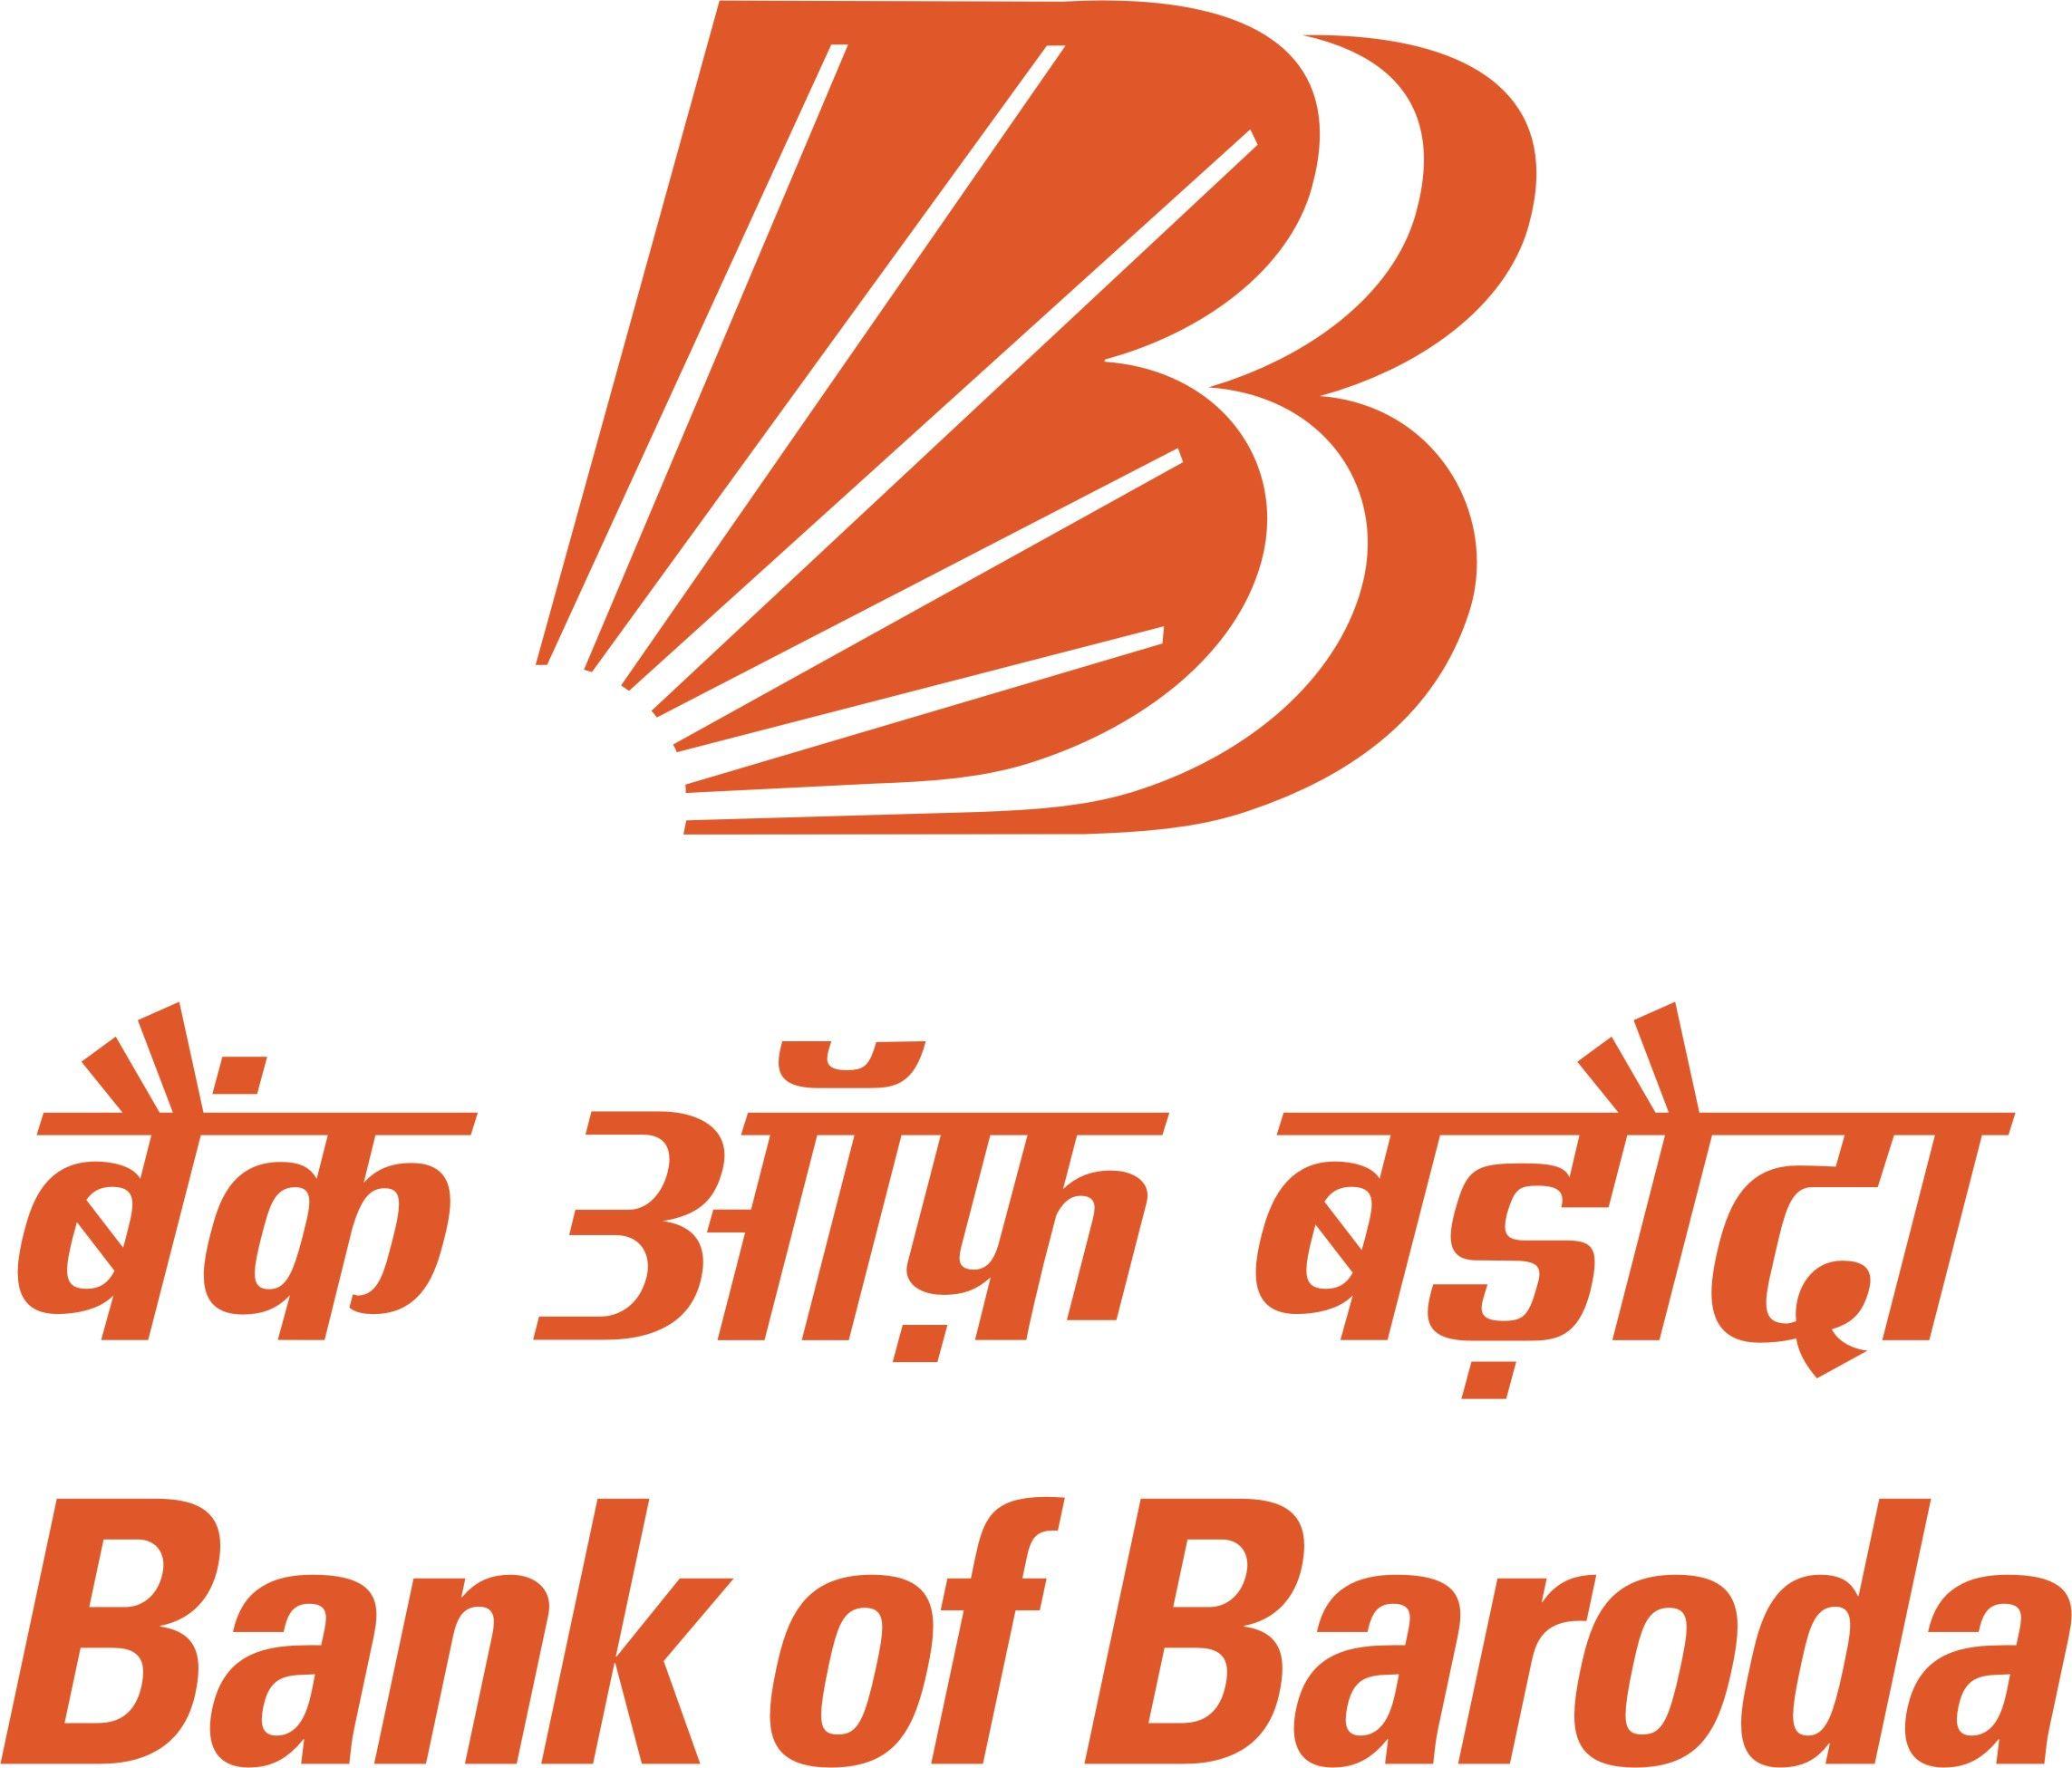 Bank of baroda recruitment bob jobs bob vacancy notification baroda bank recruitment bank of baroda latest vacancy 2017